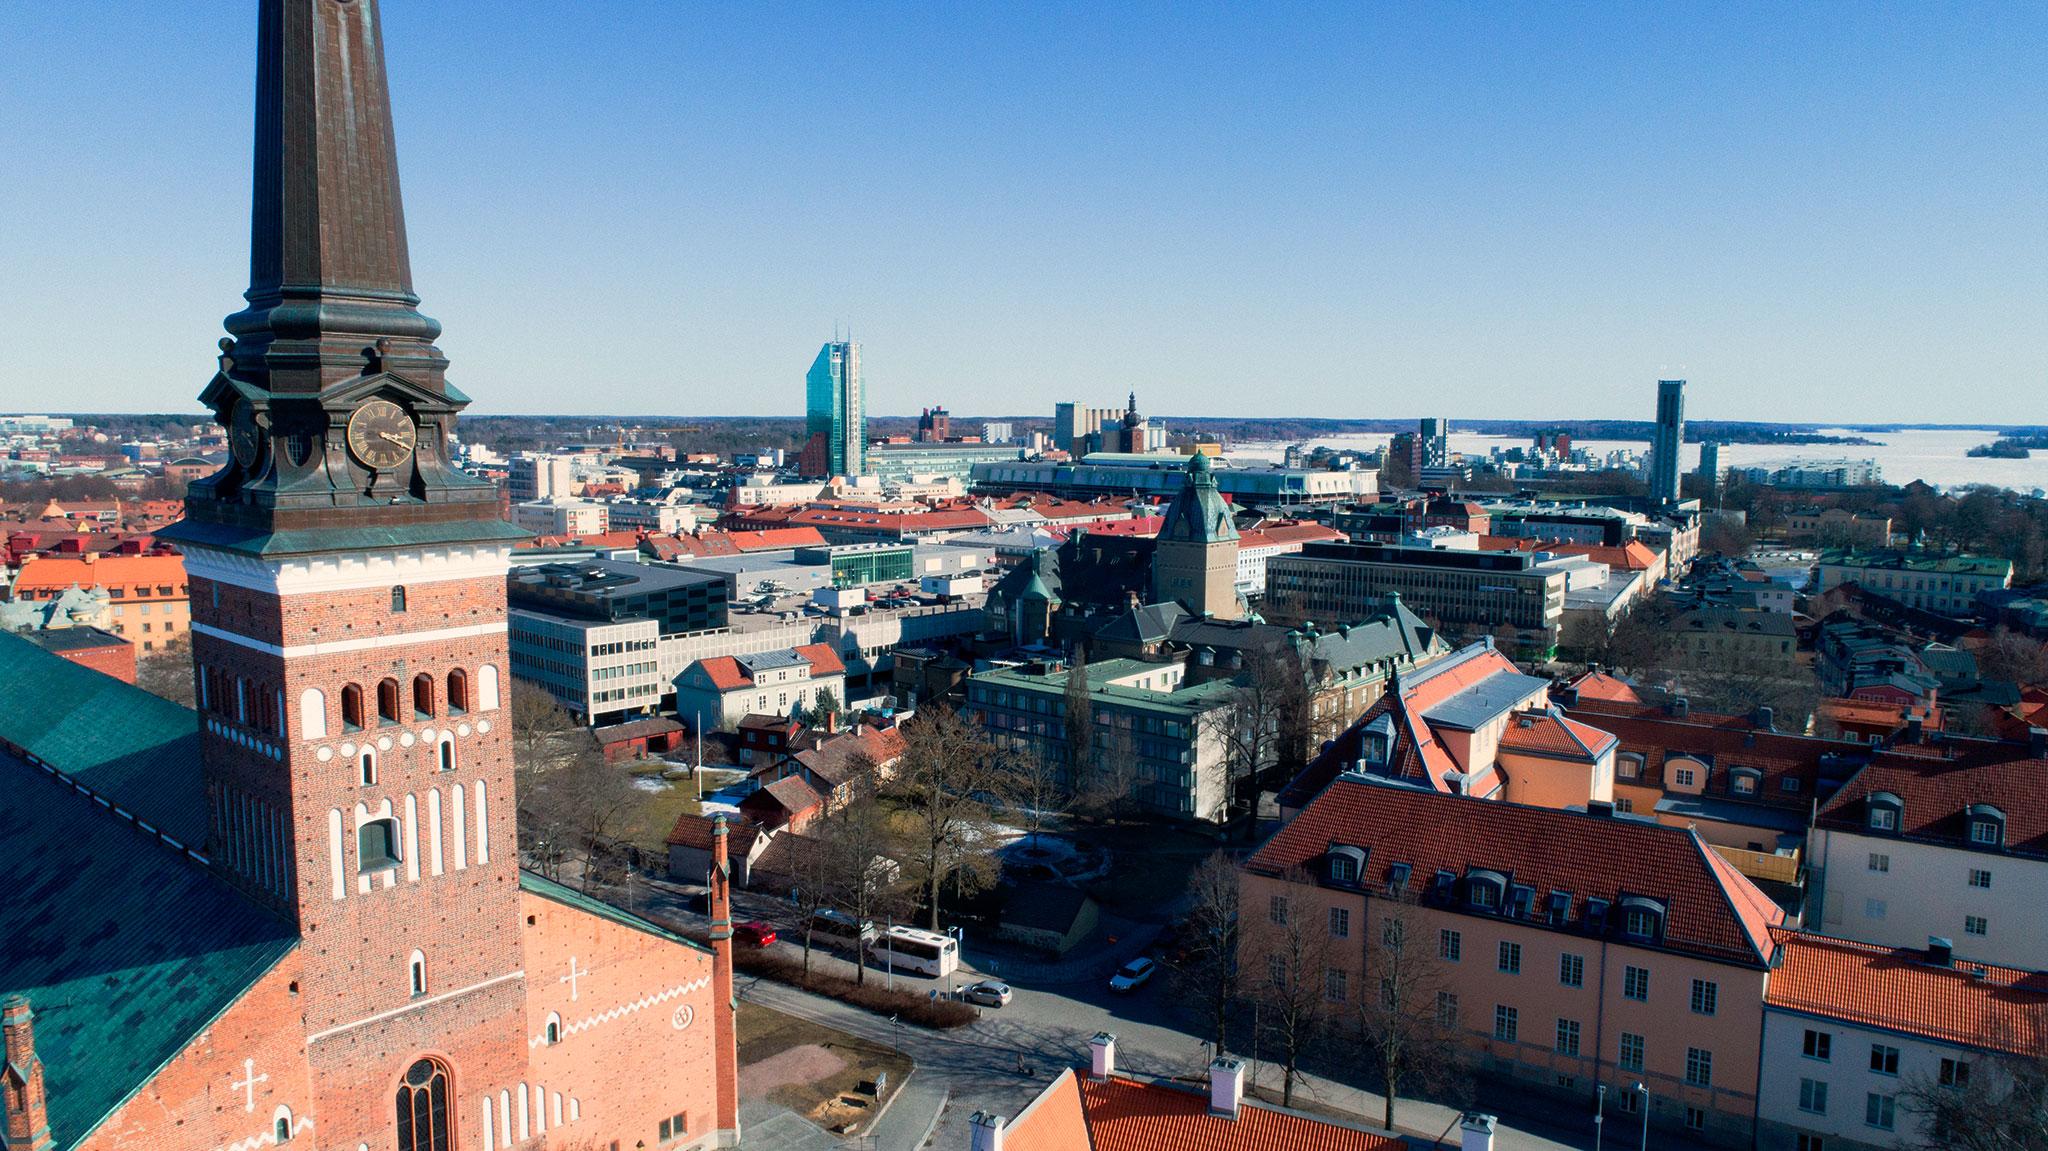 Västerås vy